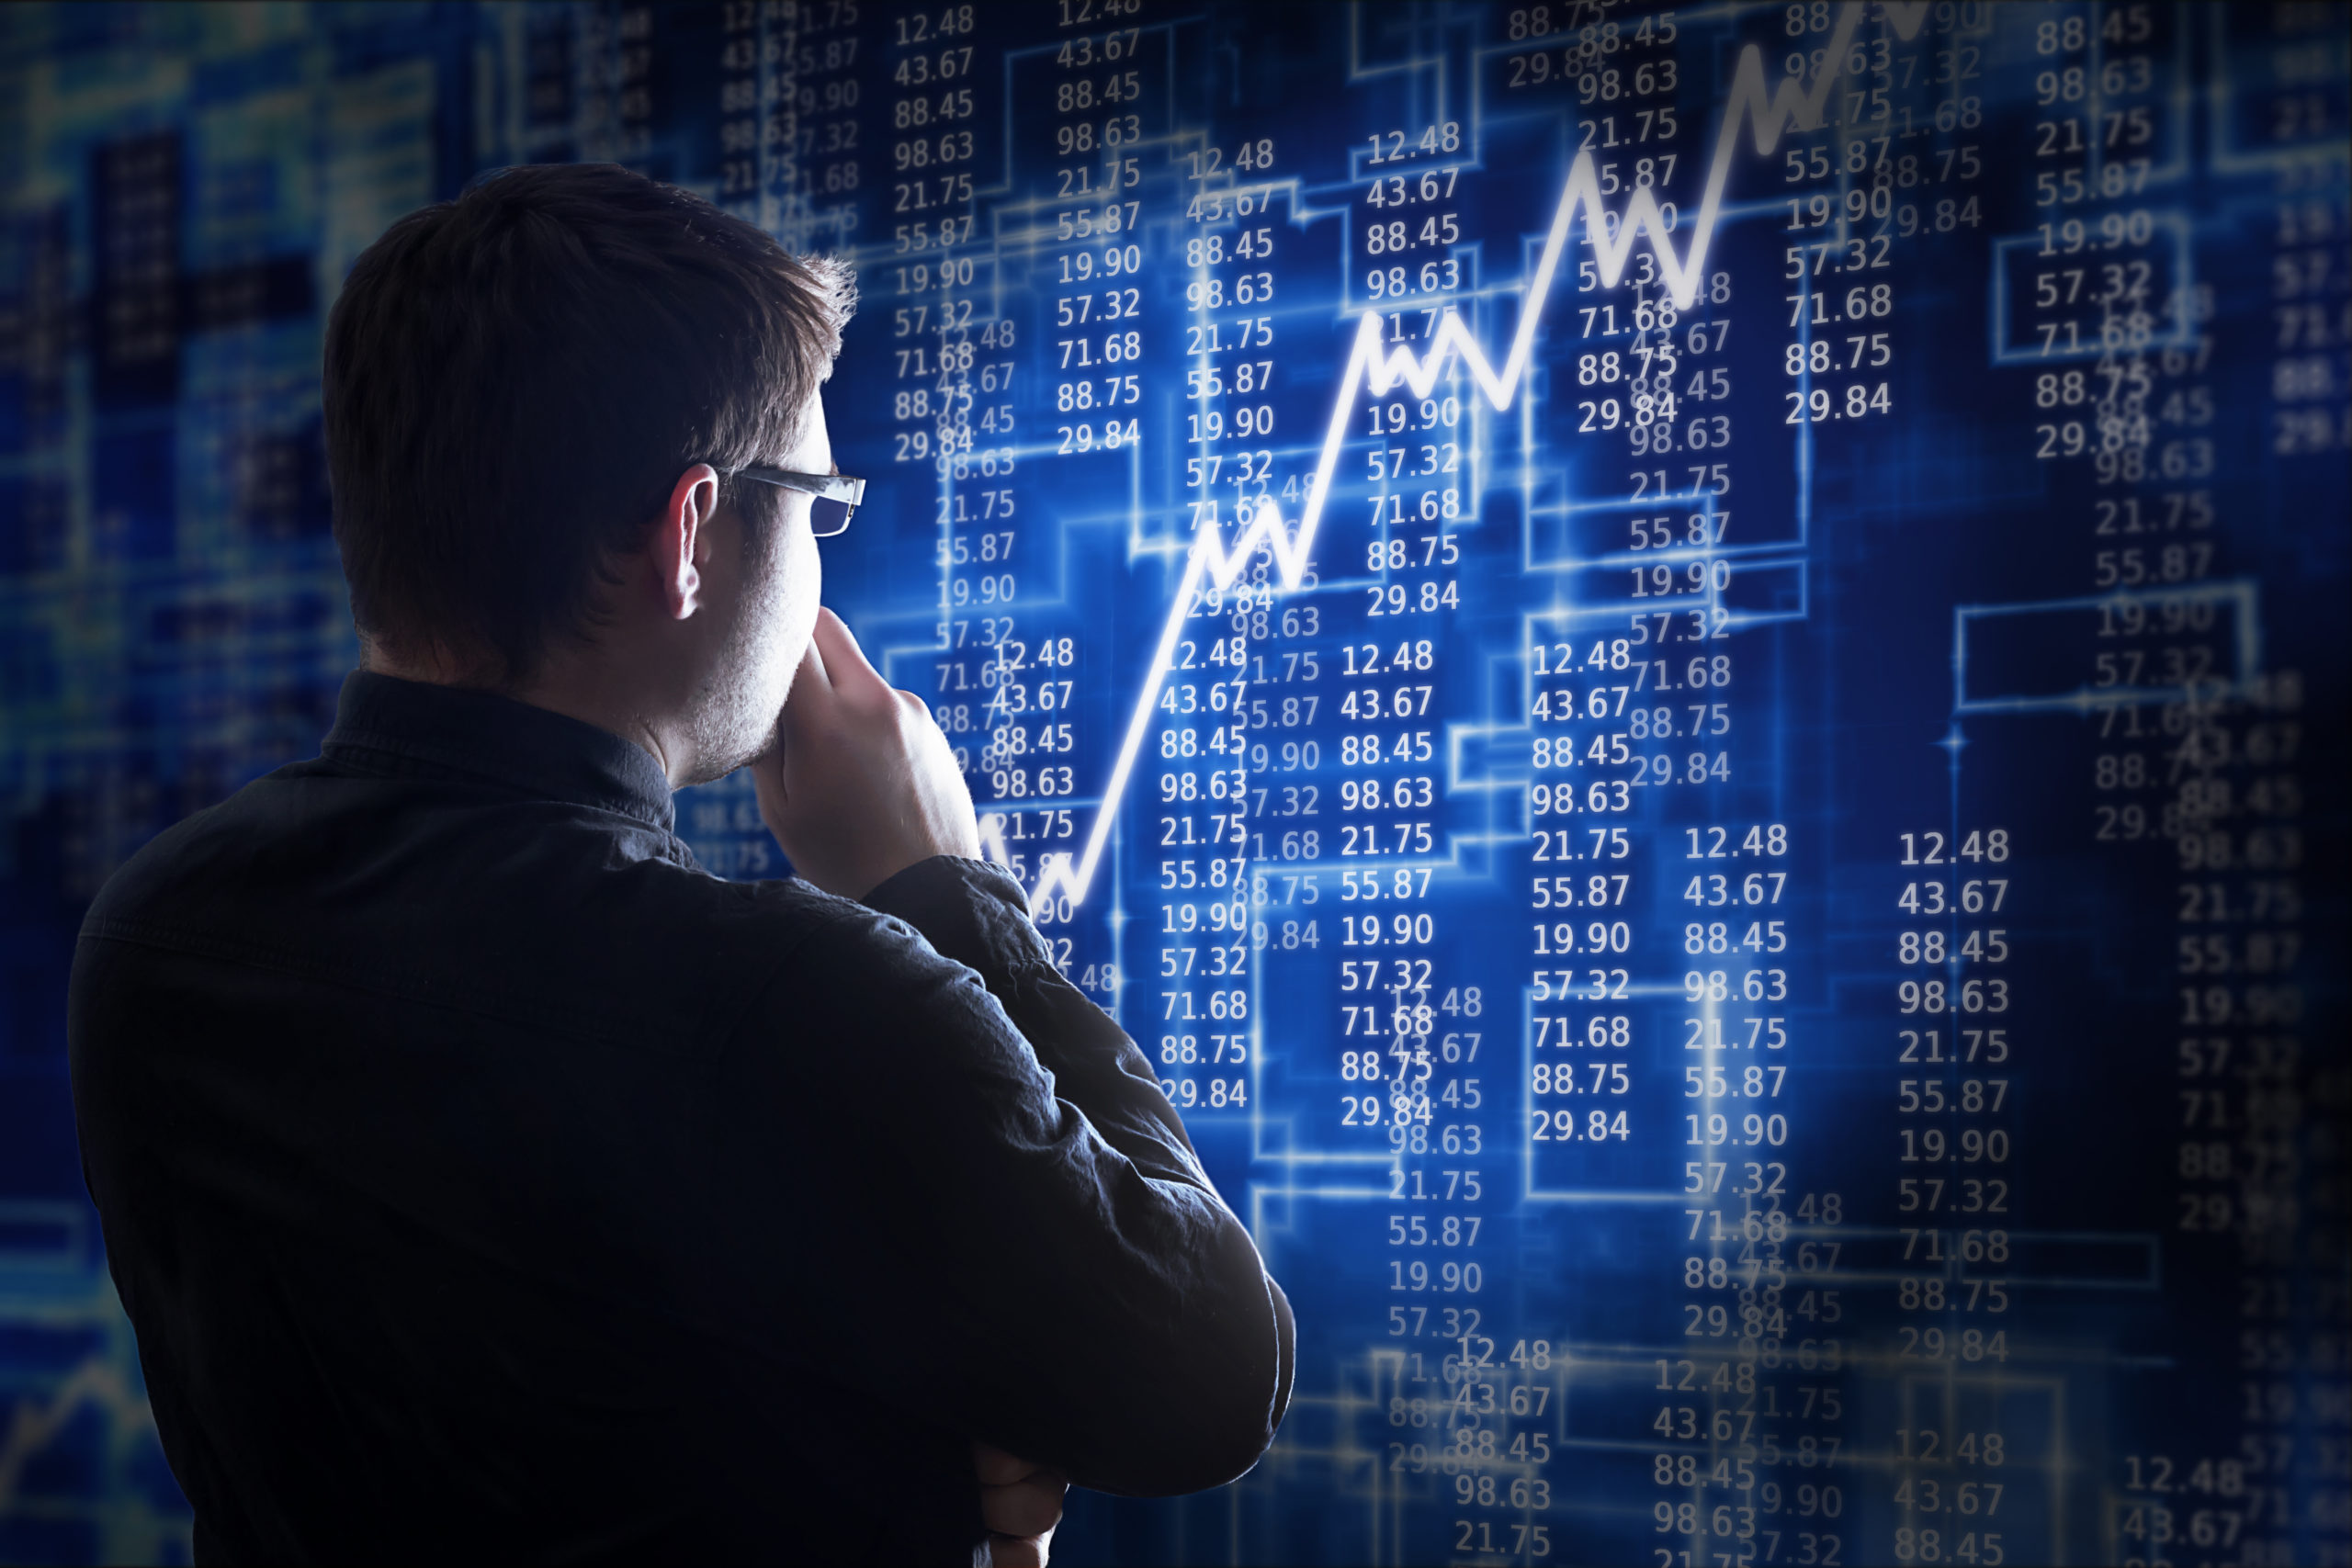 http://www.espacimmo.fr/wp-content/uploads/2021/03/investir-en-bourse-scaled.jpeg